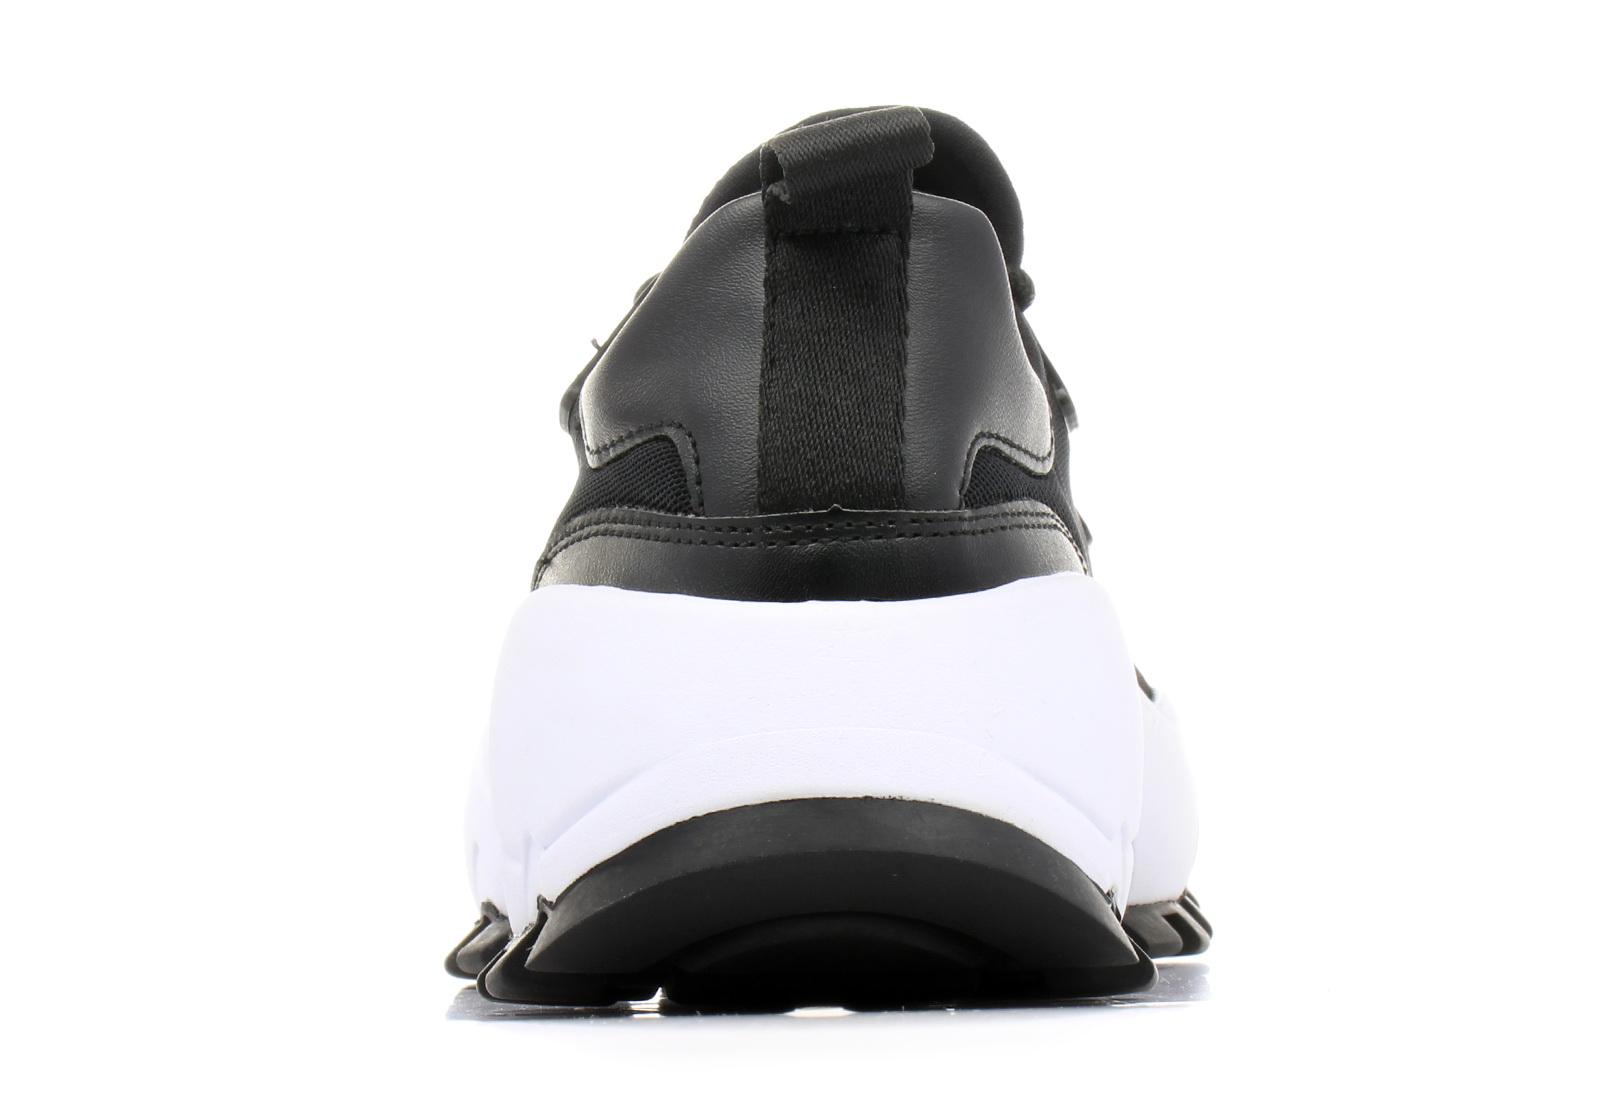 Timmy Shop Jeans Calvin Blk Klein For Shoes S0588 Online VpMqUSzG